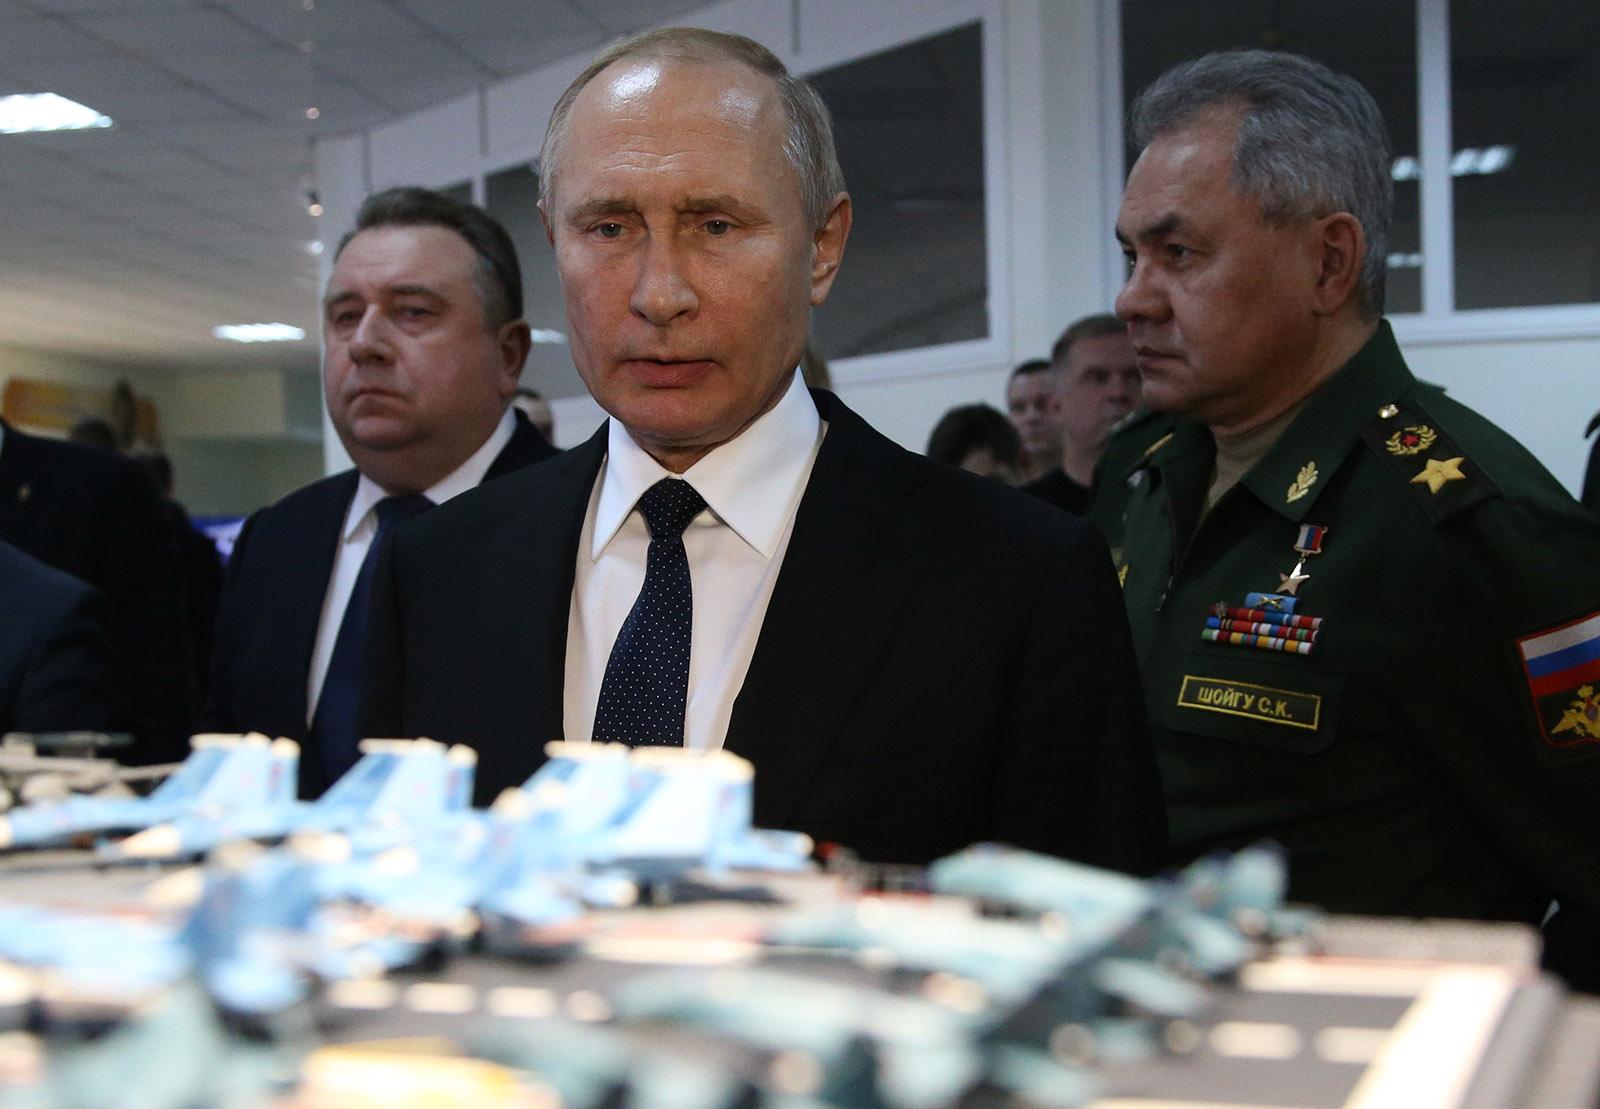 Putin examining a model aircraft carrier